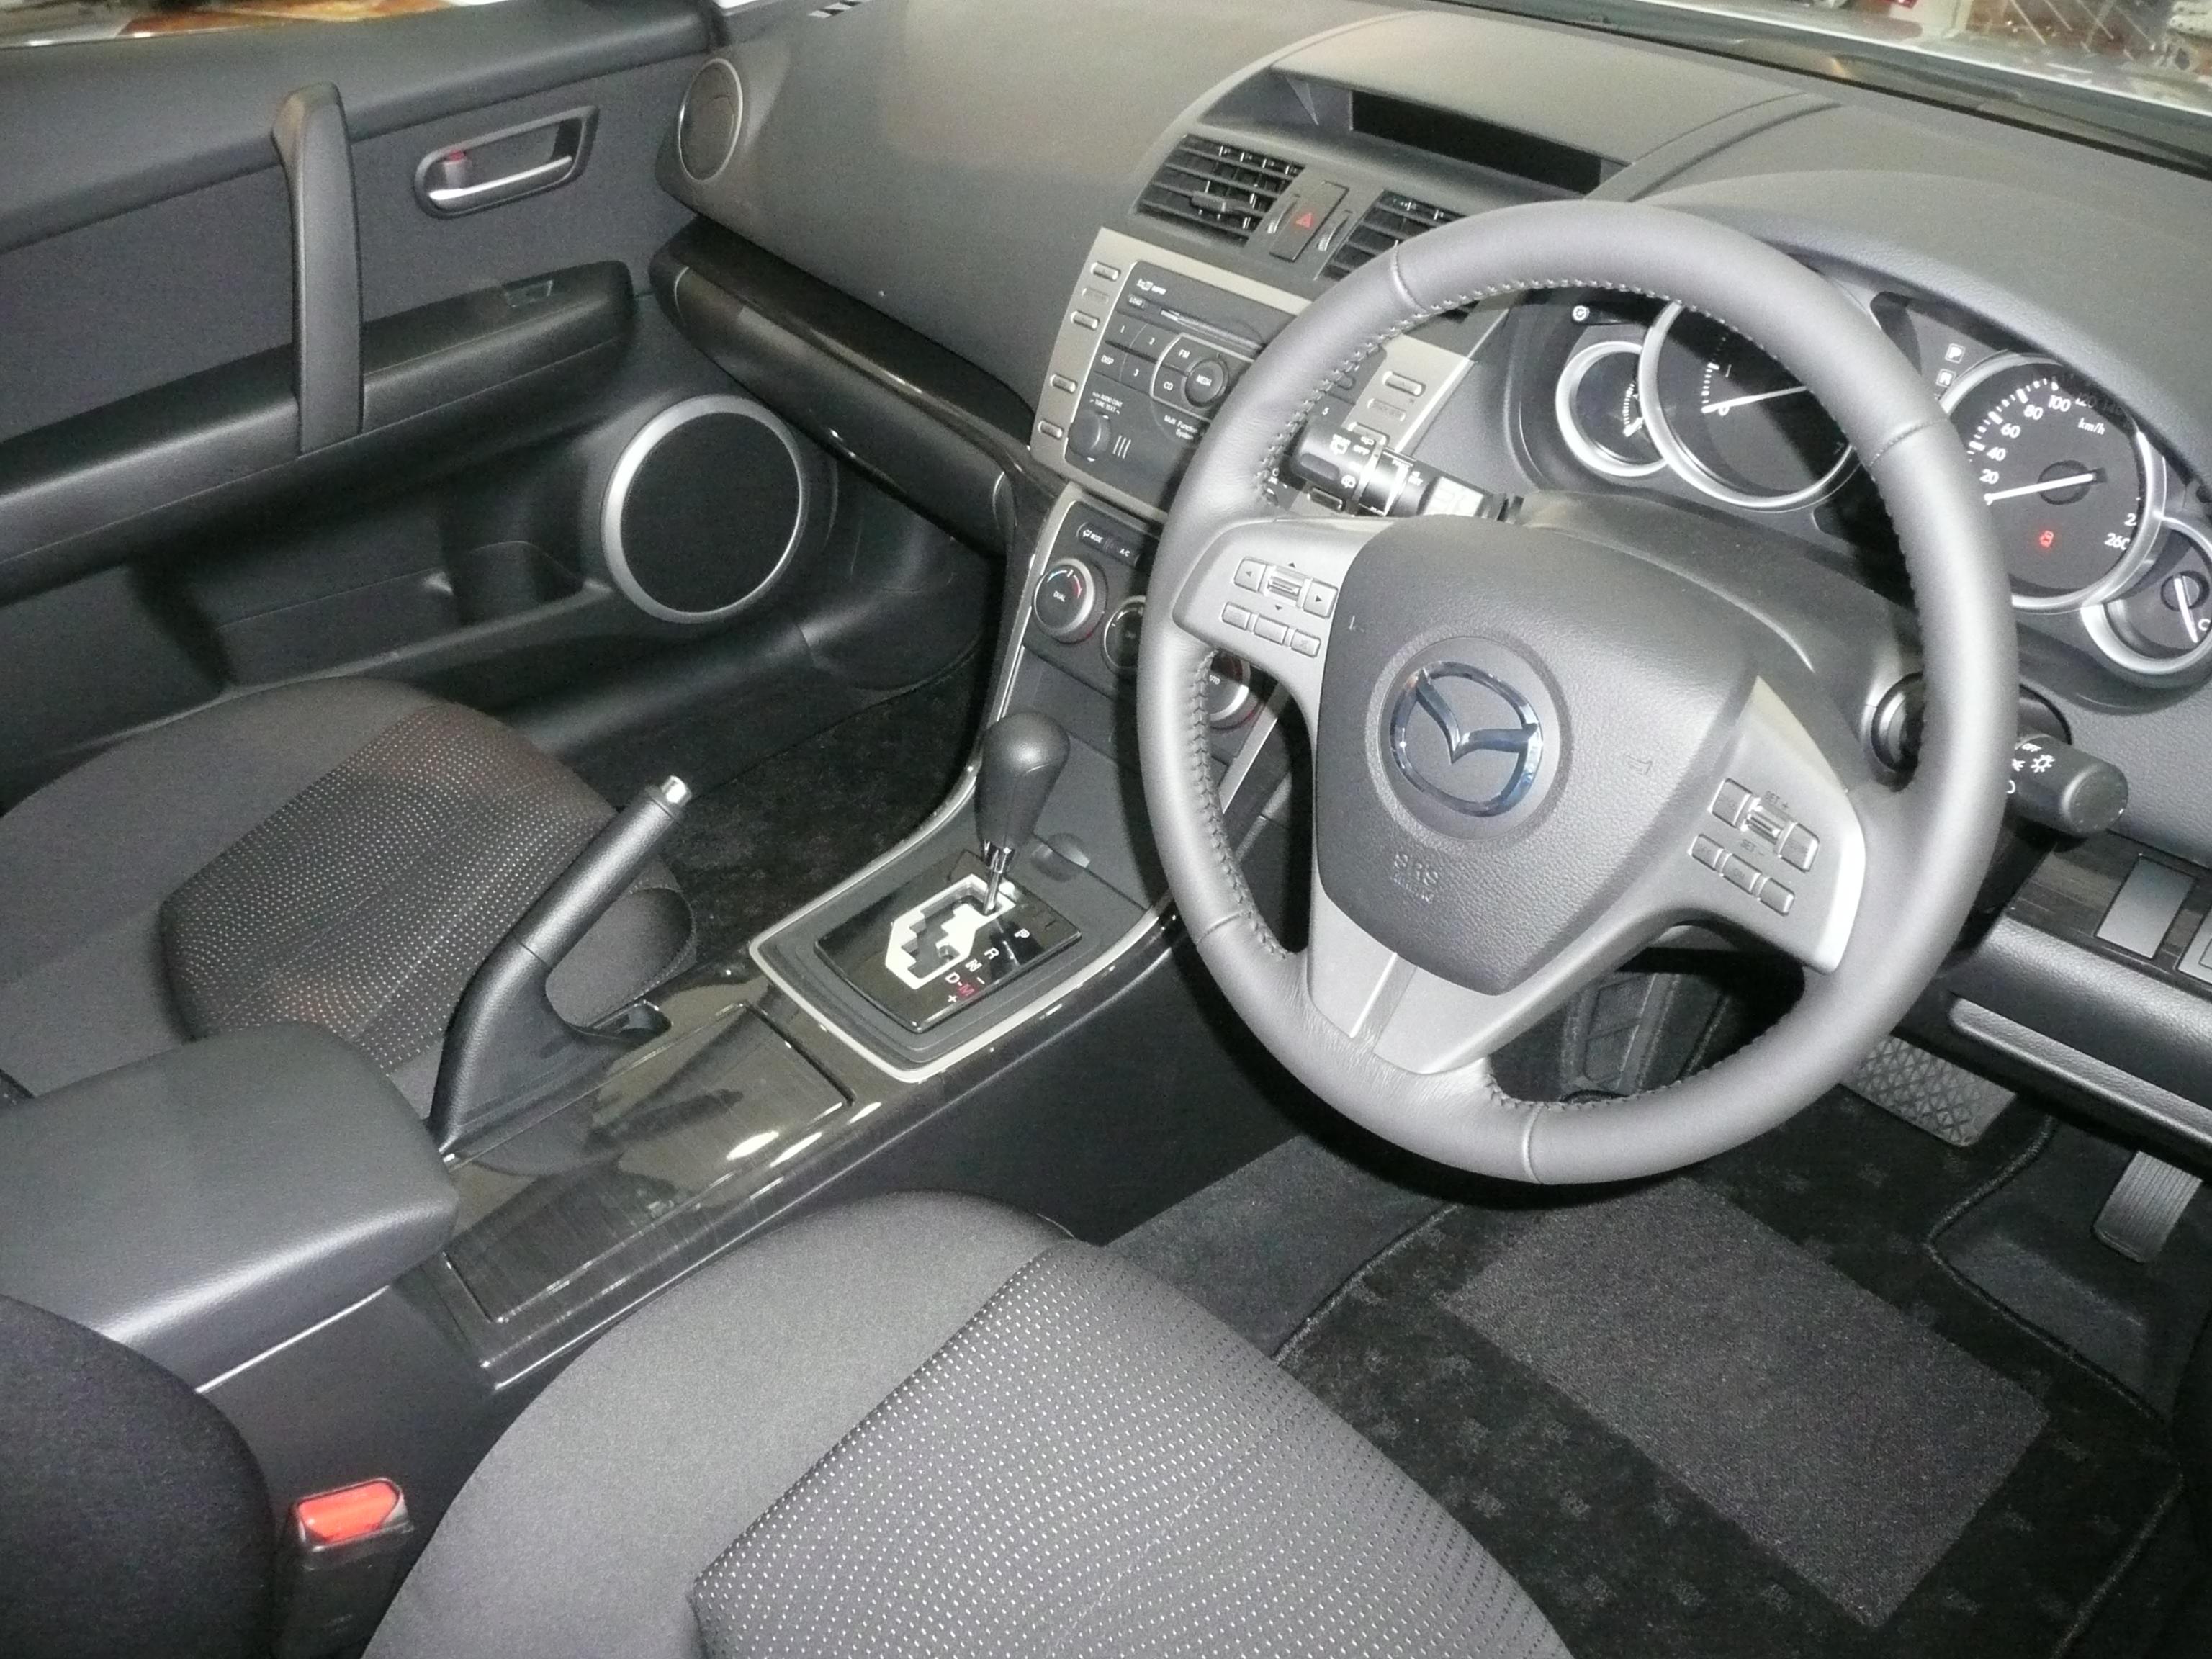 http://carsot.com/images/mazda-6-i-gg-restyling-2005-2008-station-wagon-5-door-interior-1.jpg